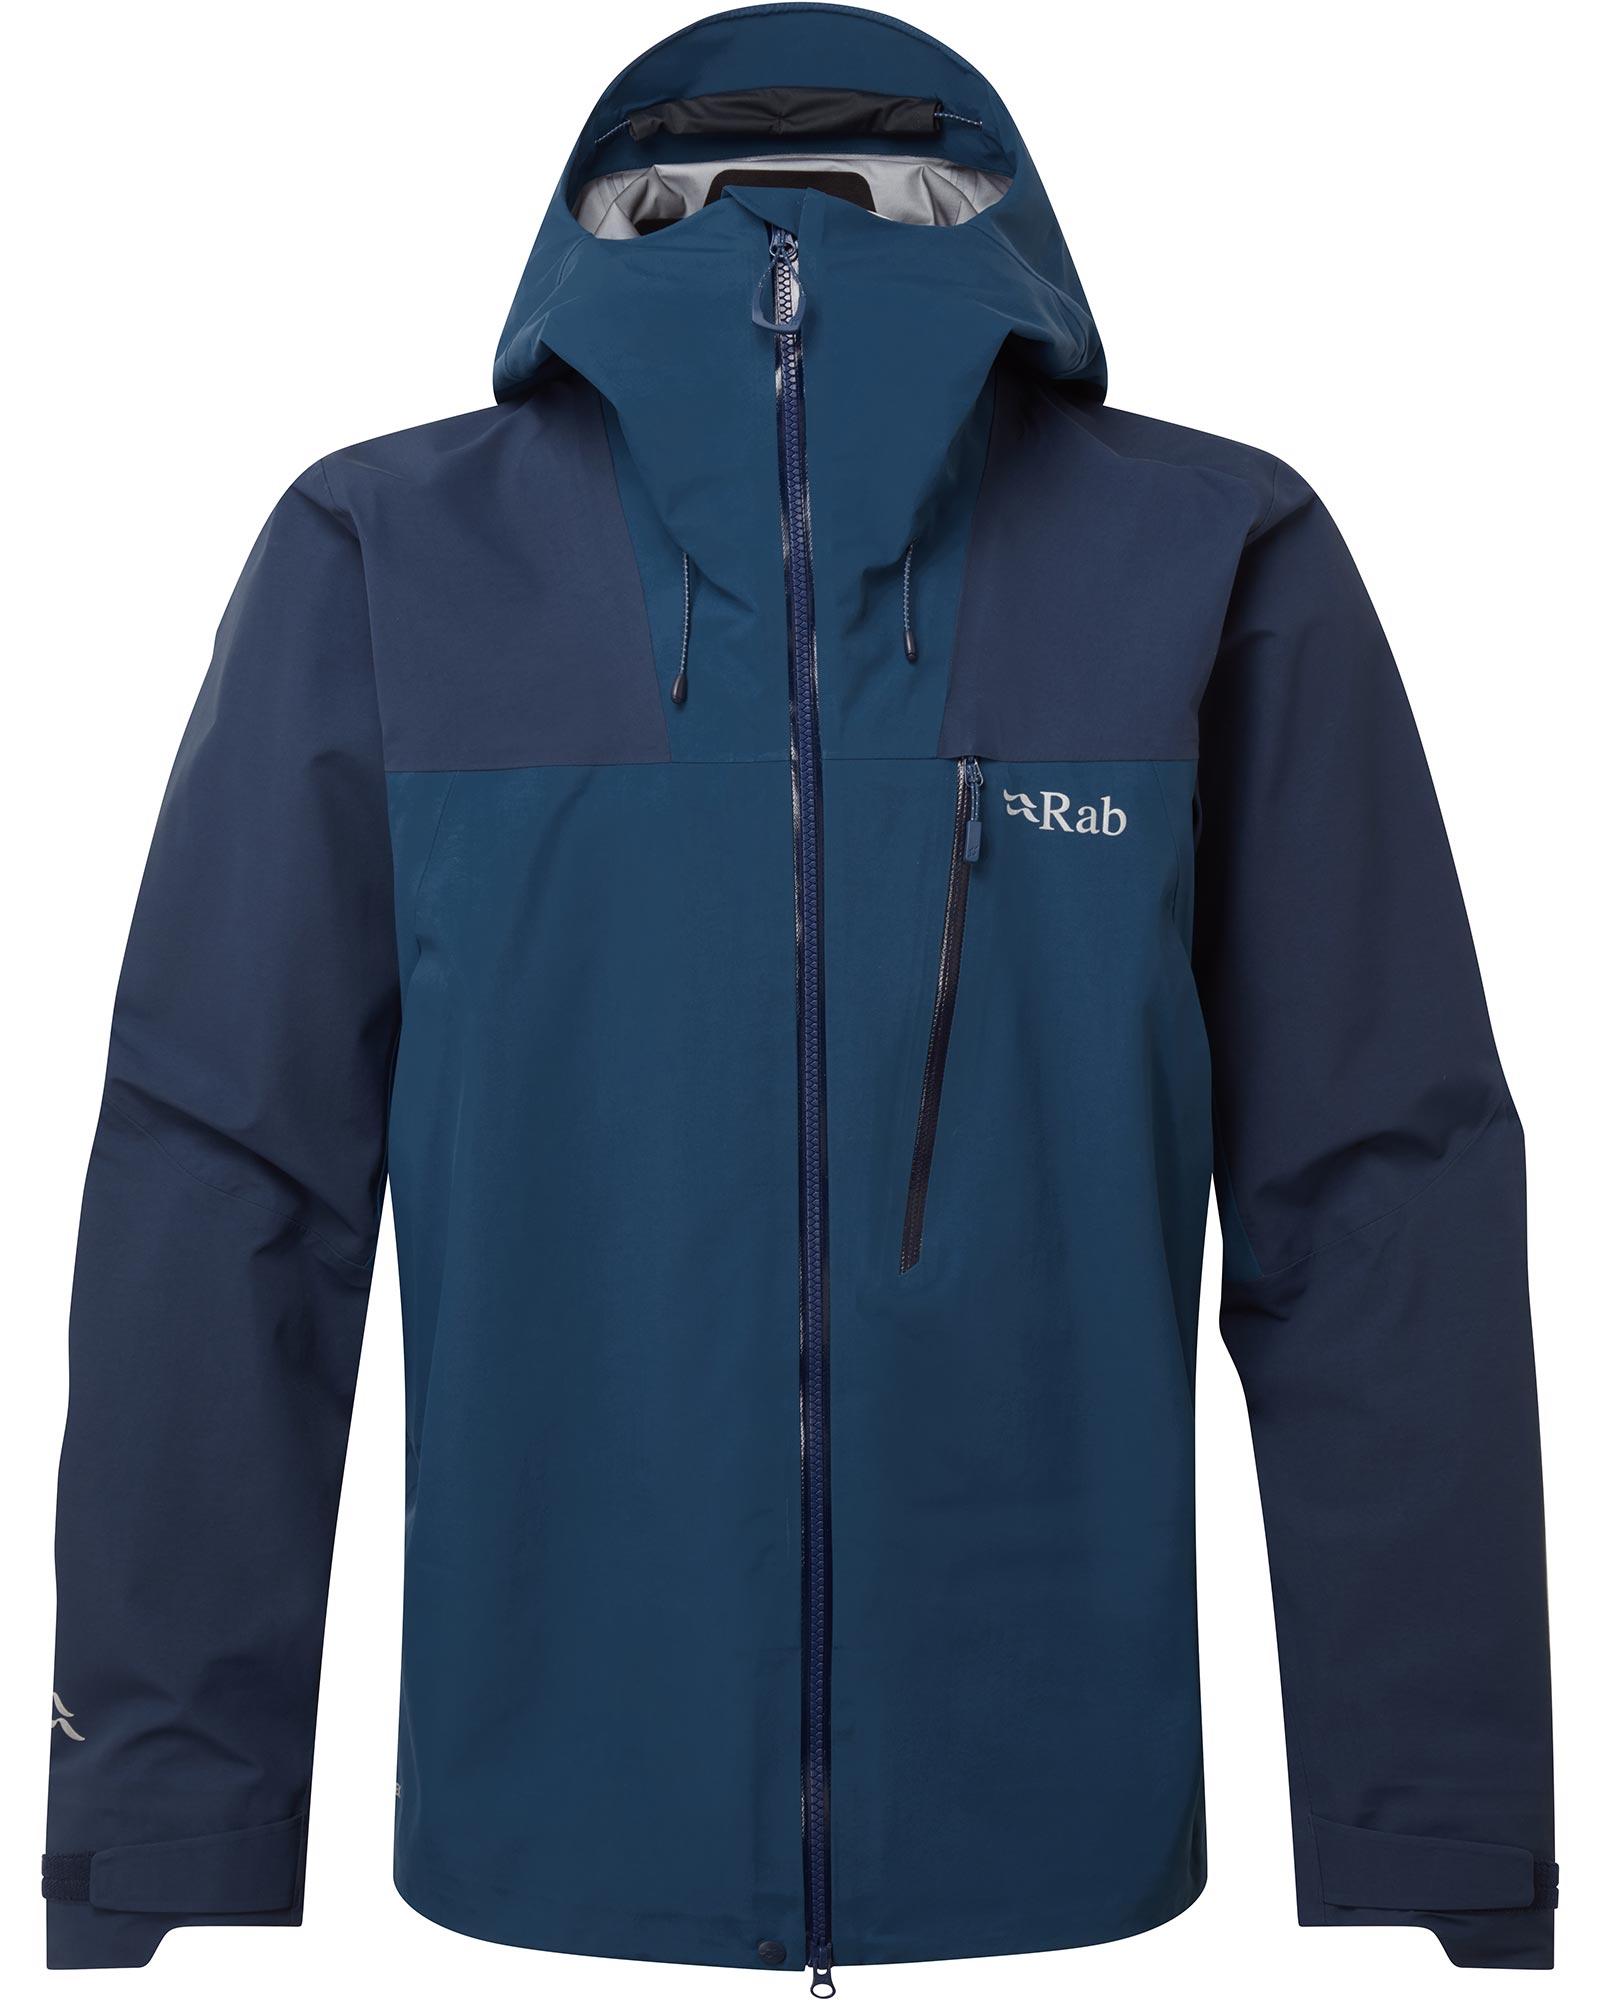 Rab Men's Ladakh GORE-TEX Jacket 0